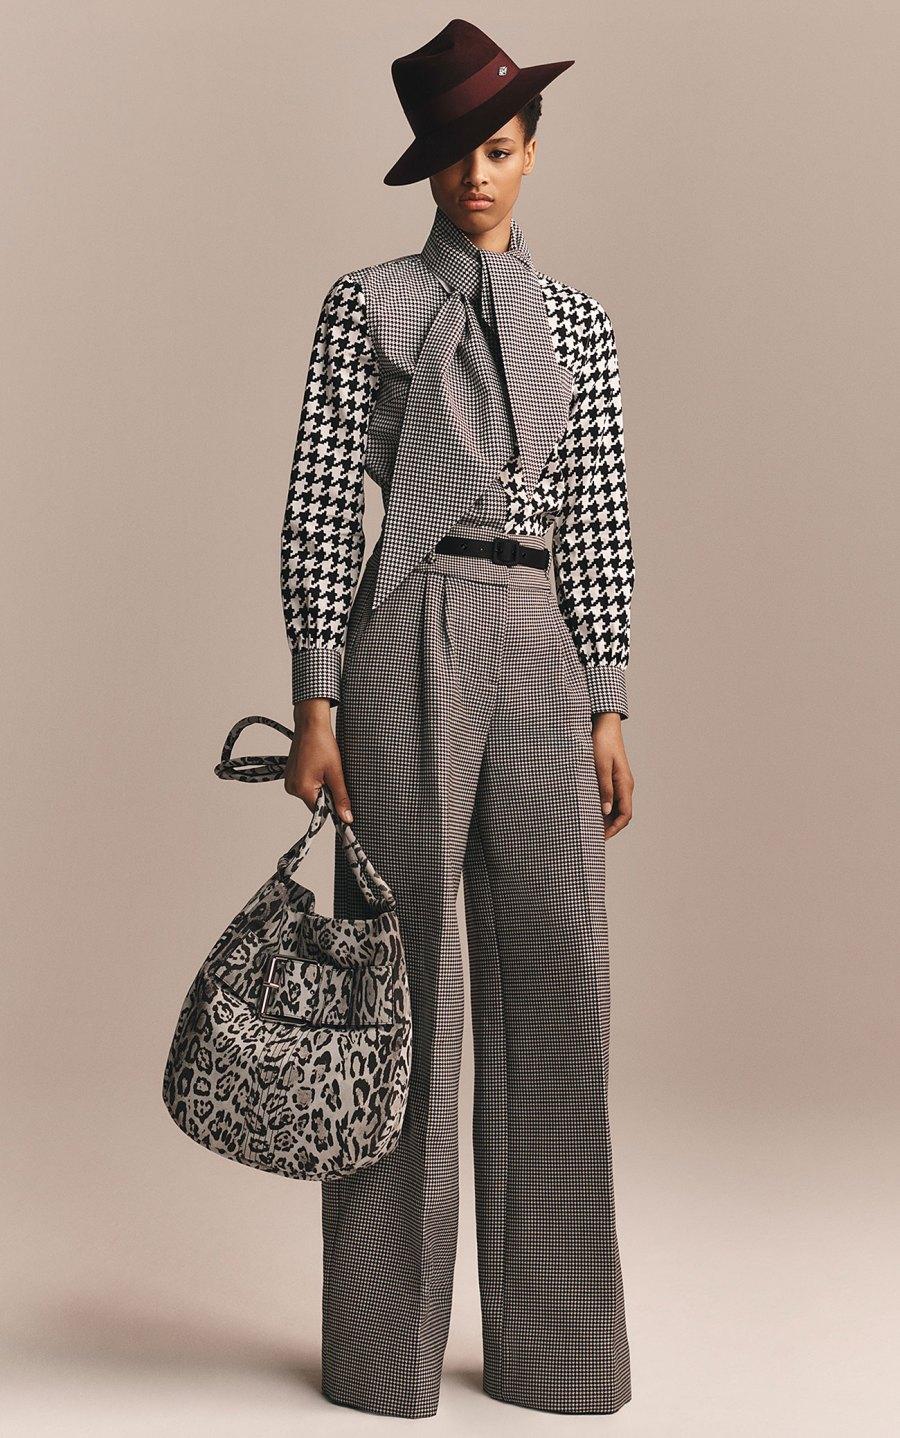 Zendaya x Tommy Hilfiger Collection - Zendaya Houndstooth Tie Neck Shirt and Trousers